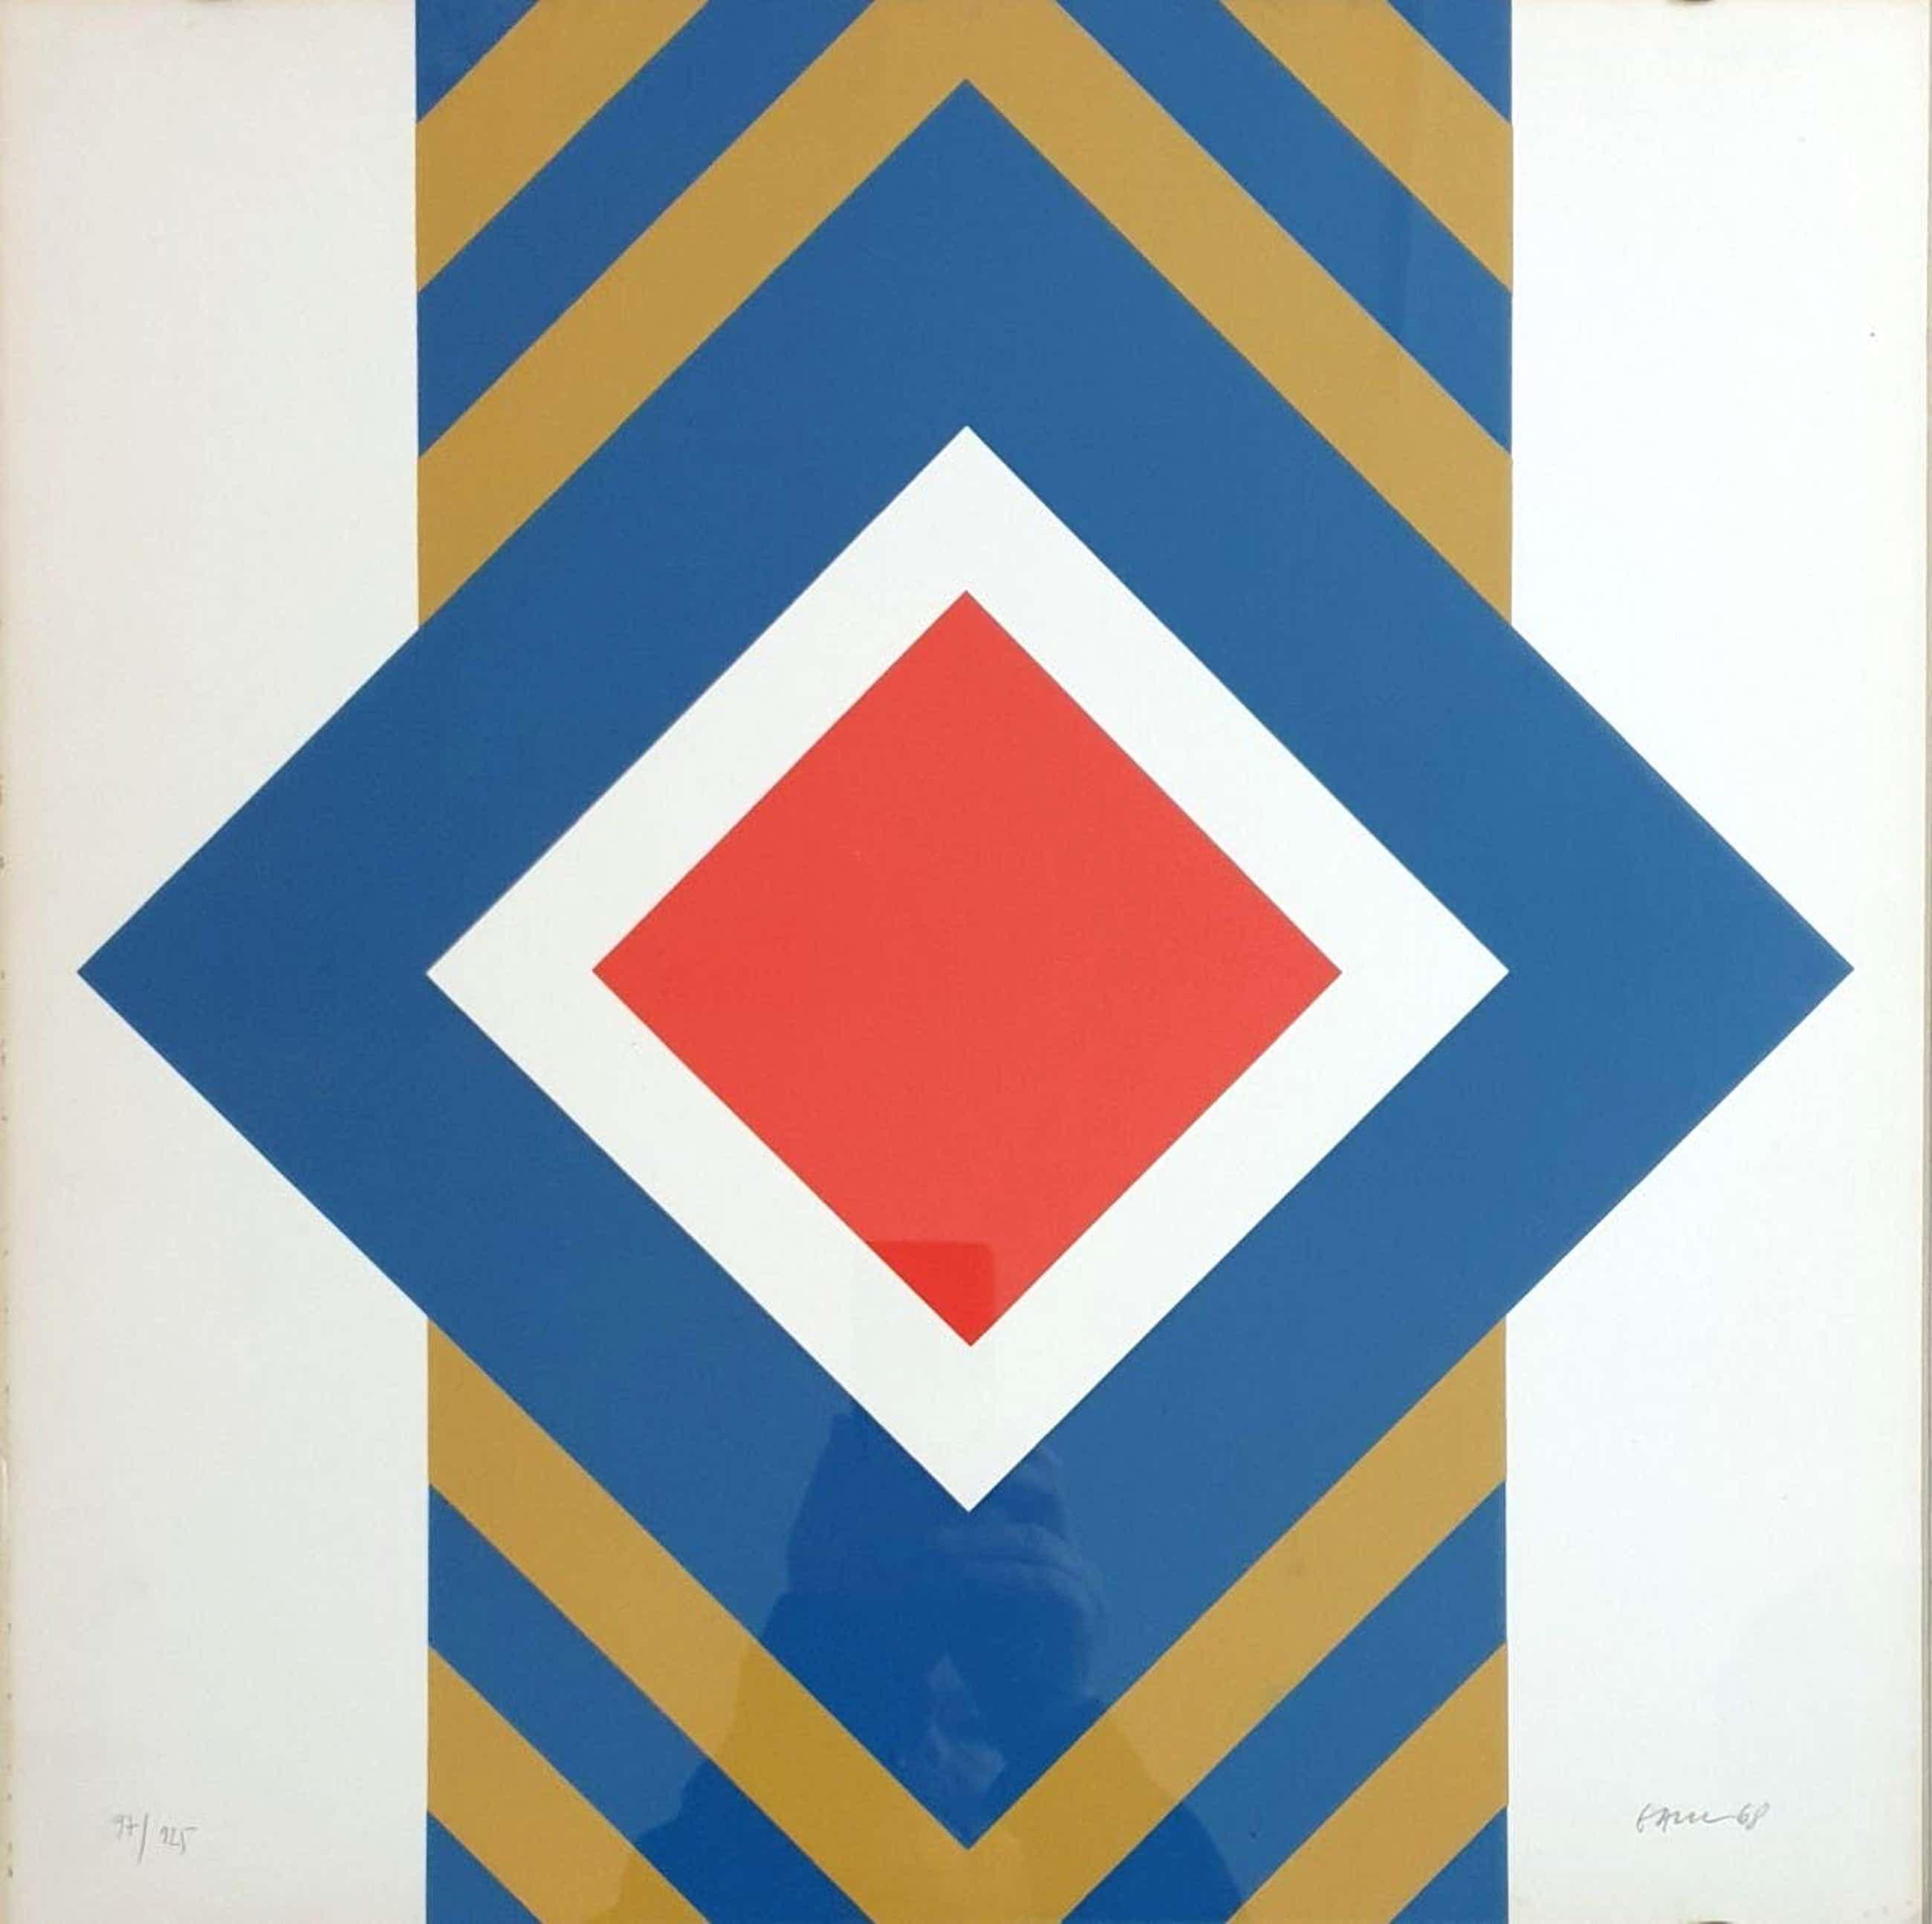 Winfred Gaul - Seriegrafie 1968 o.T. signiert numeriert Ed. 125 kopen? Bied vanaf 240!